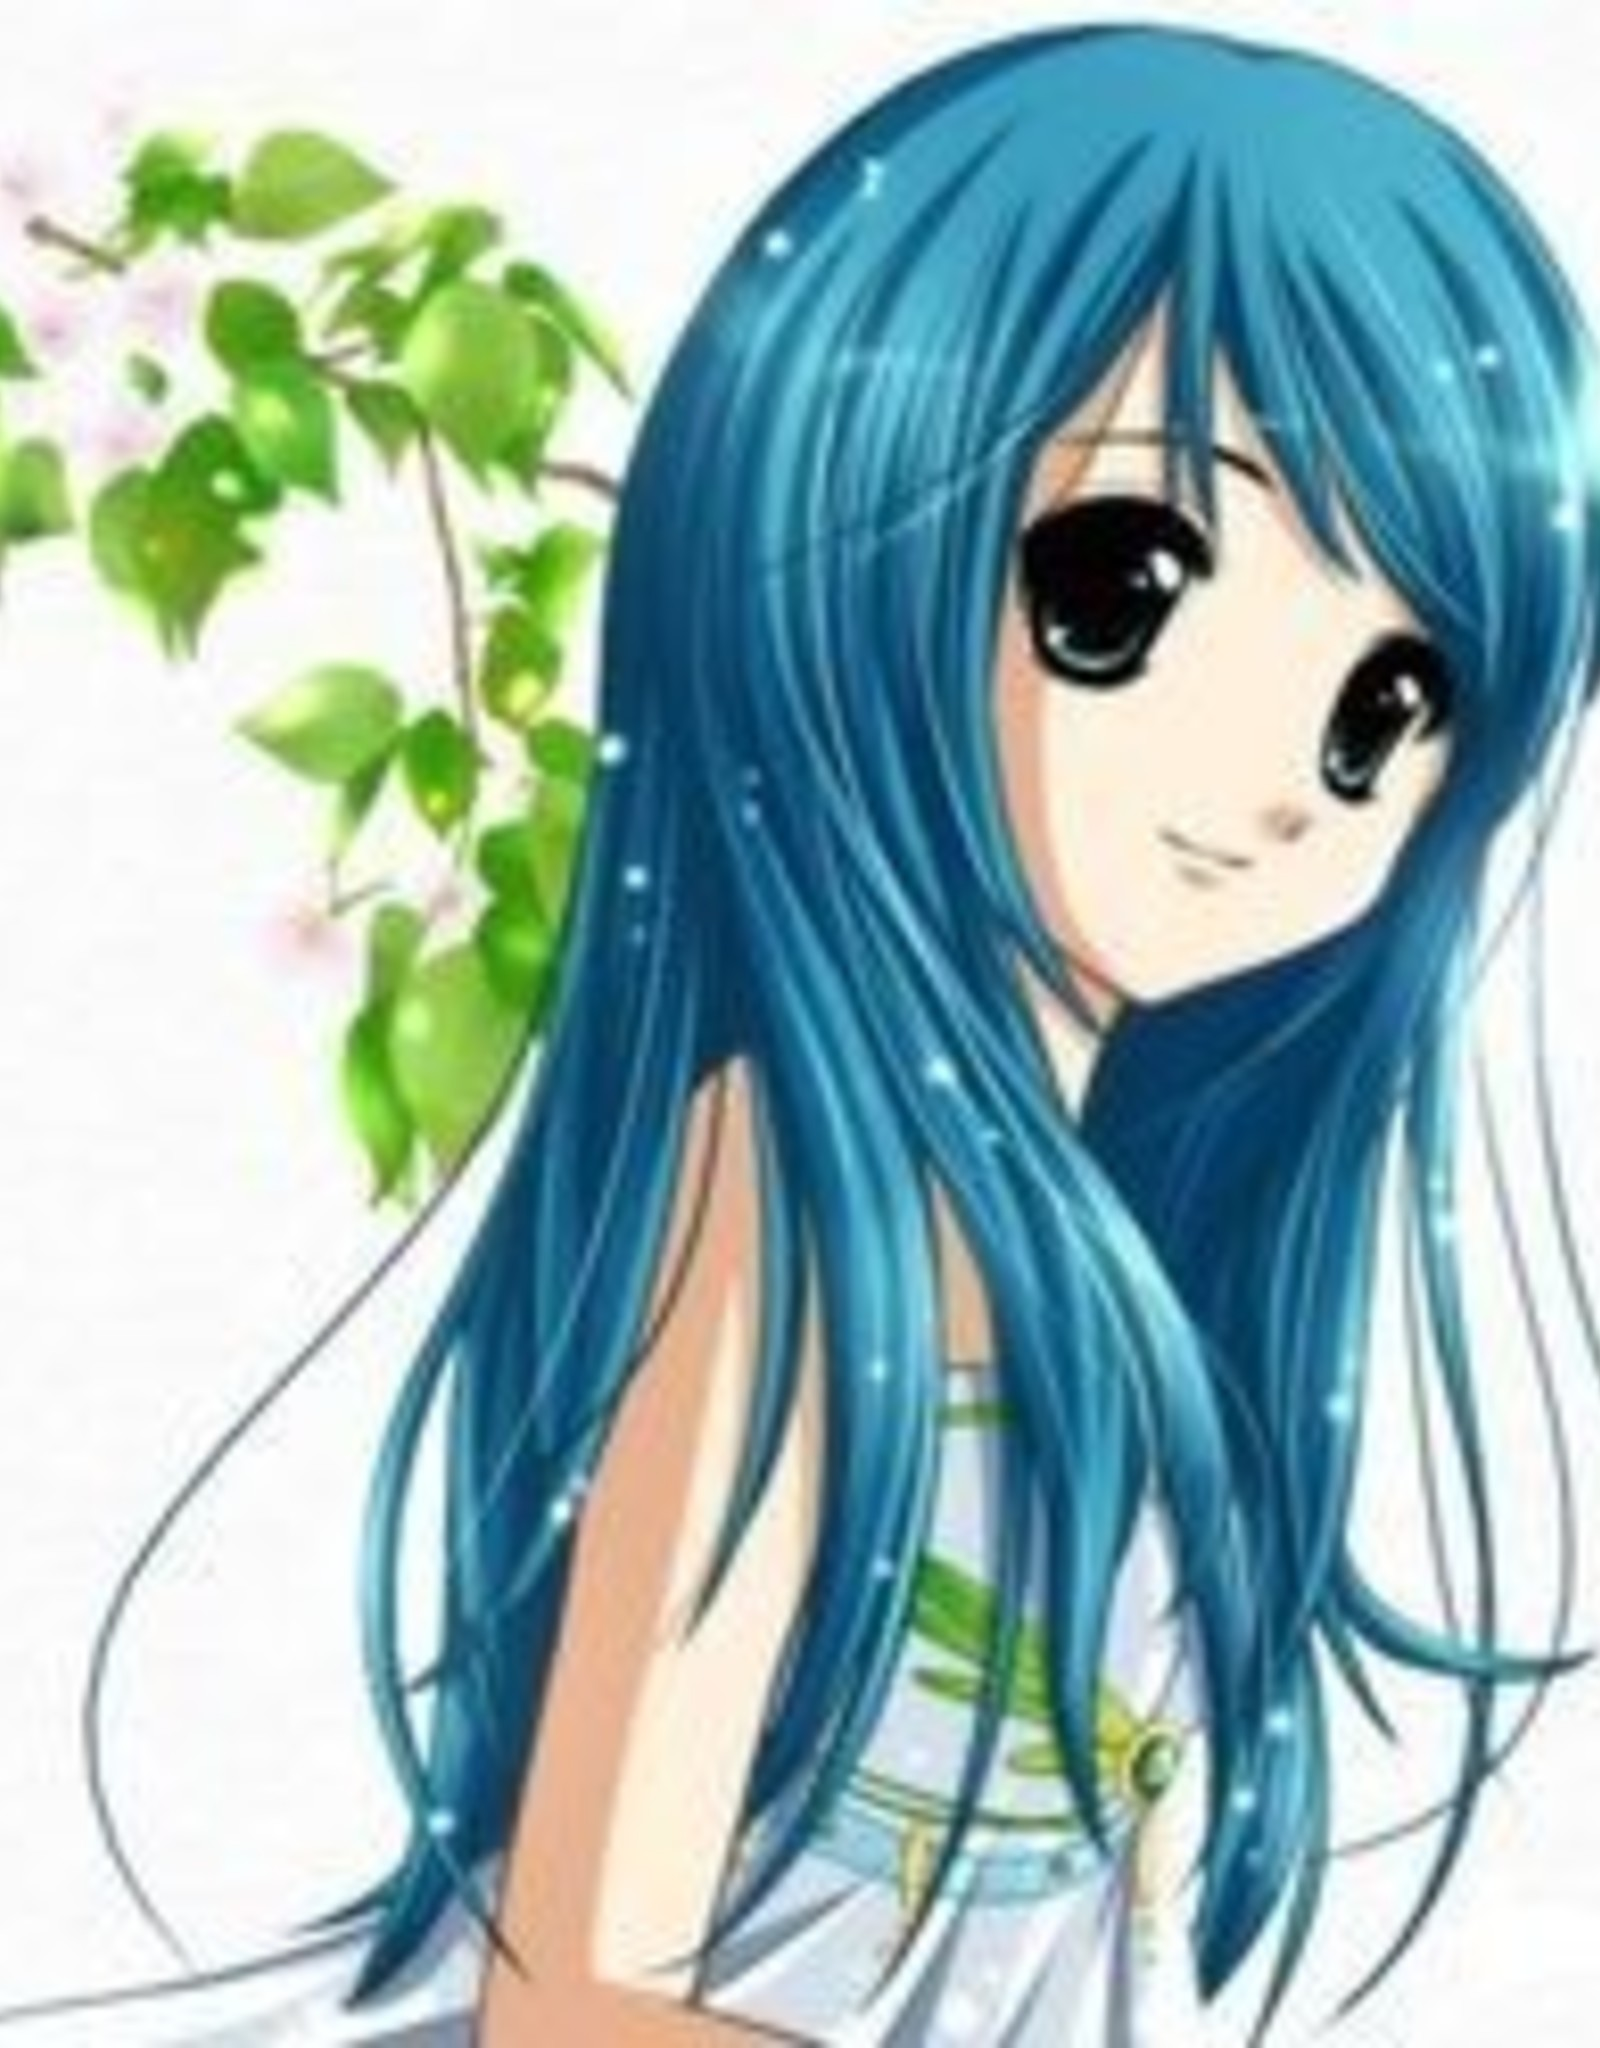 Ahmed A Drawing Art Class Anime/Manga Virtual Sat 1:00  -2:00 pm